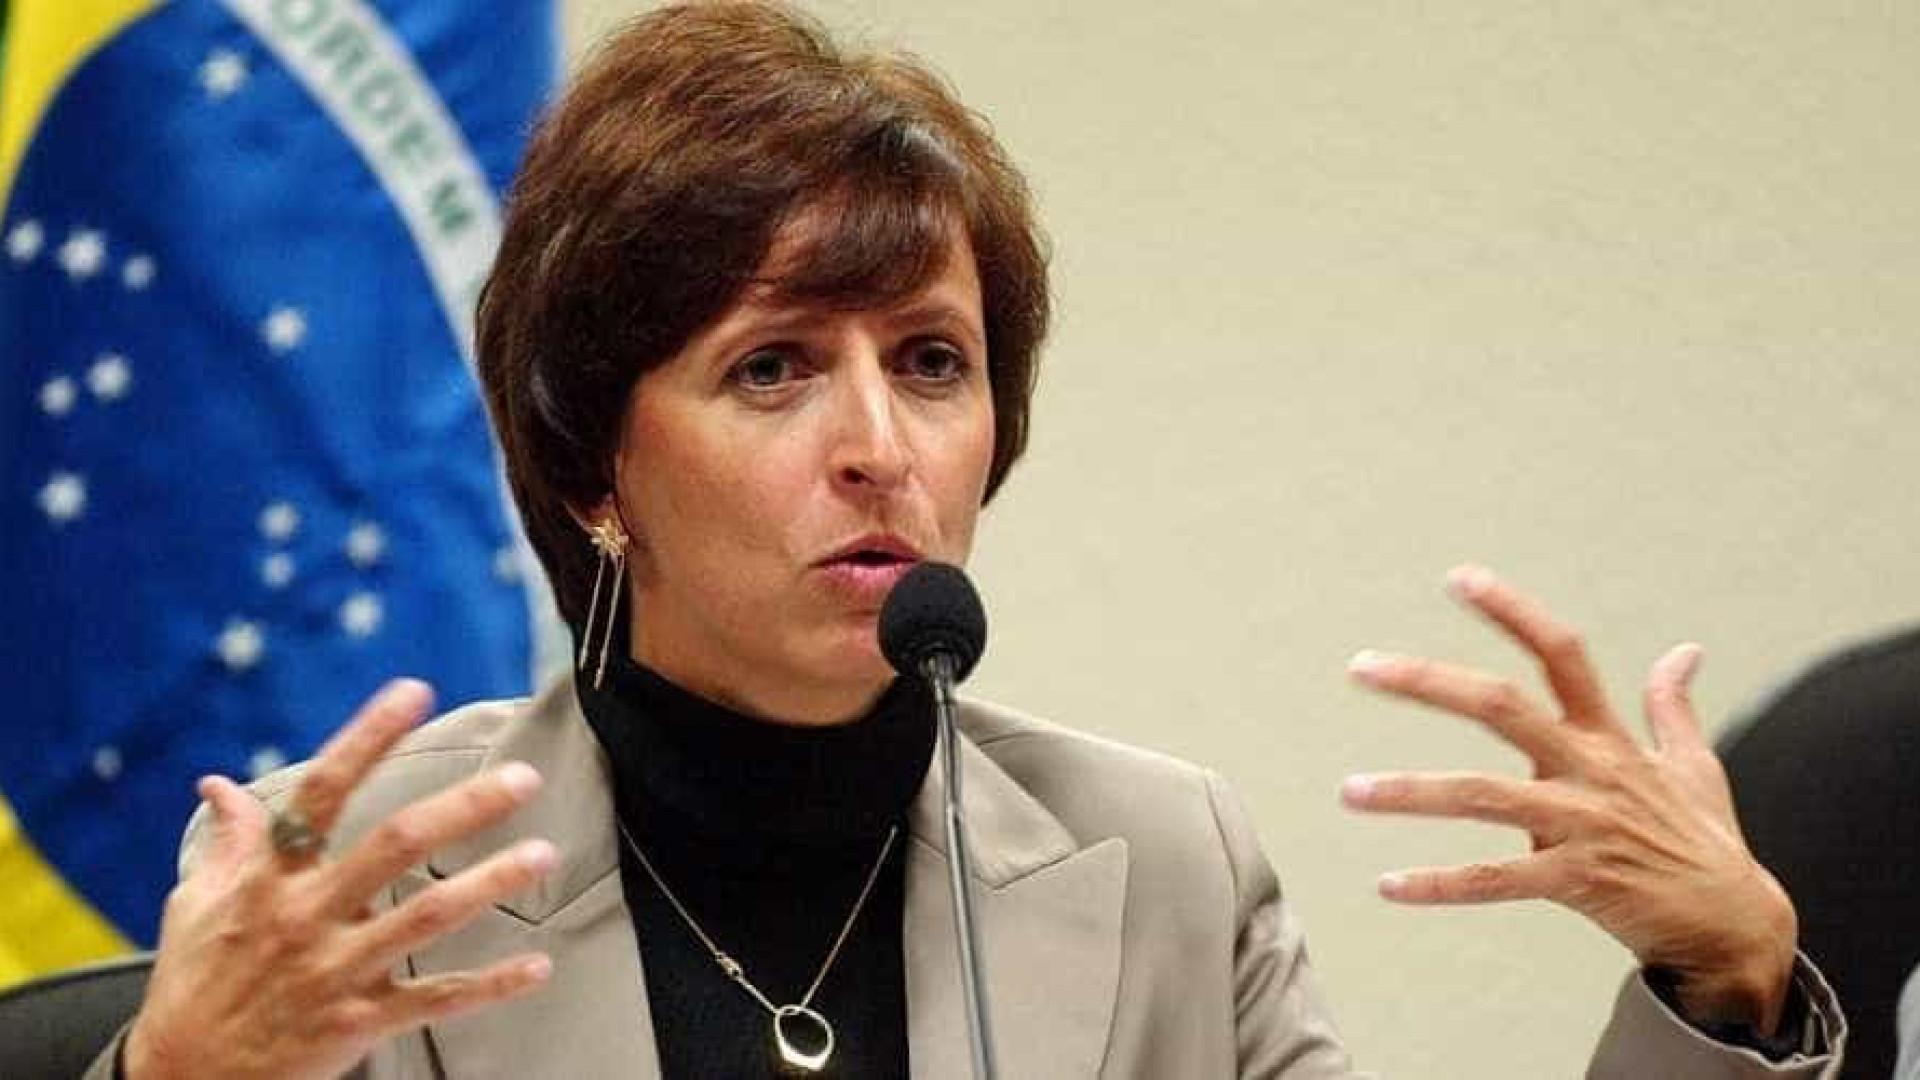 Indulto assinado por Temer beneficia condenados no mensalão